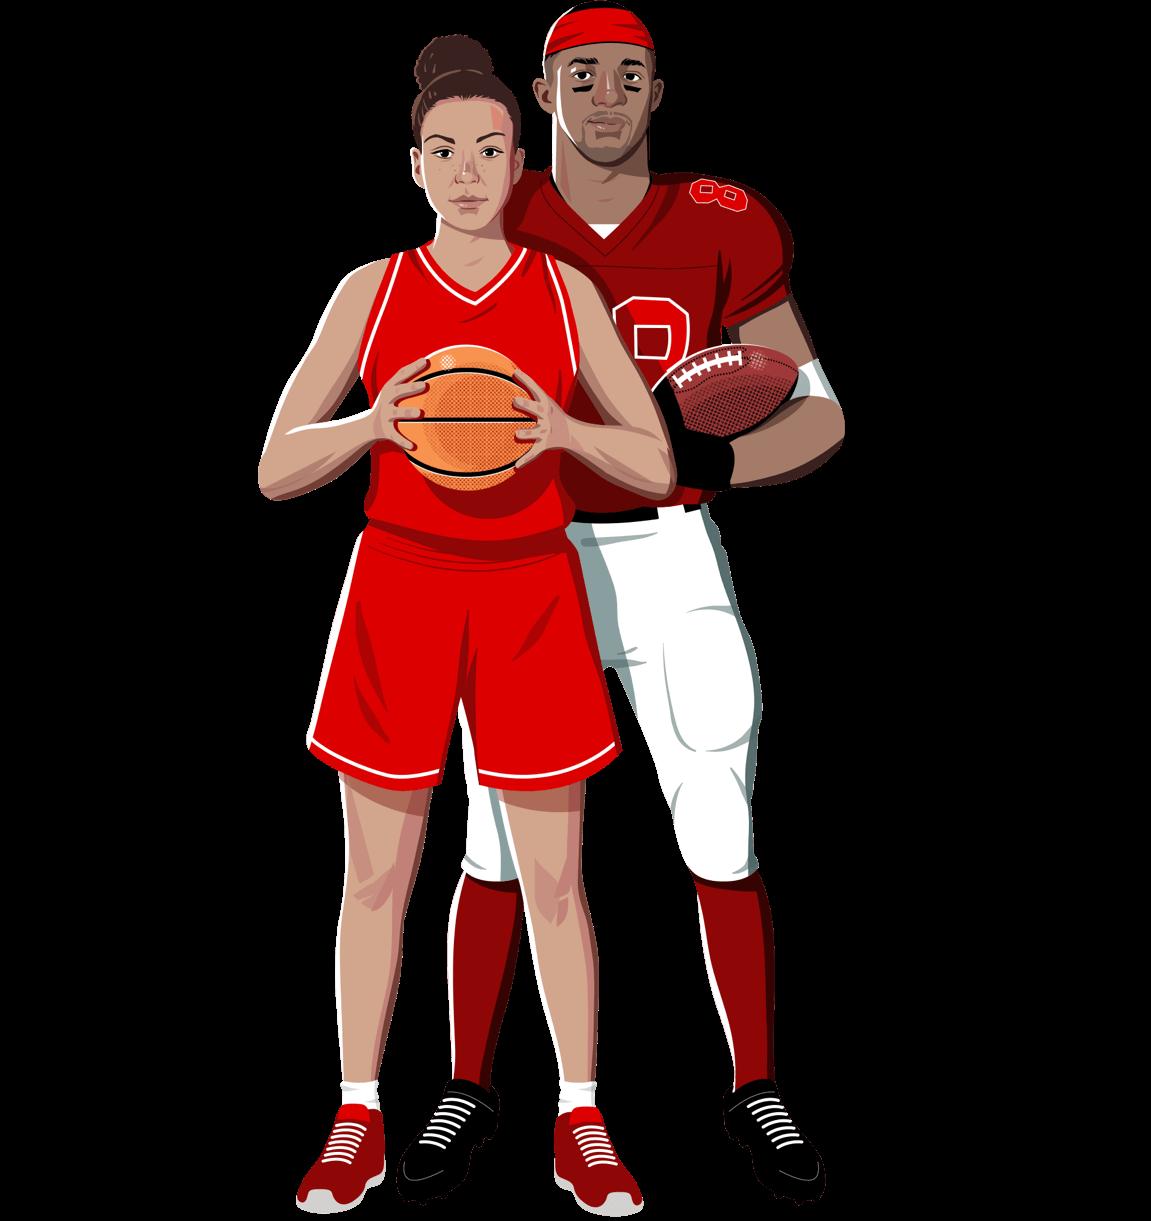 Scholarship Athlete